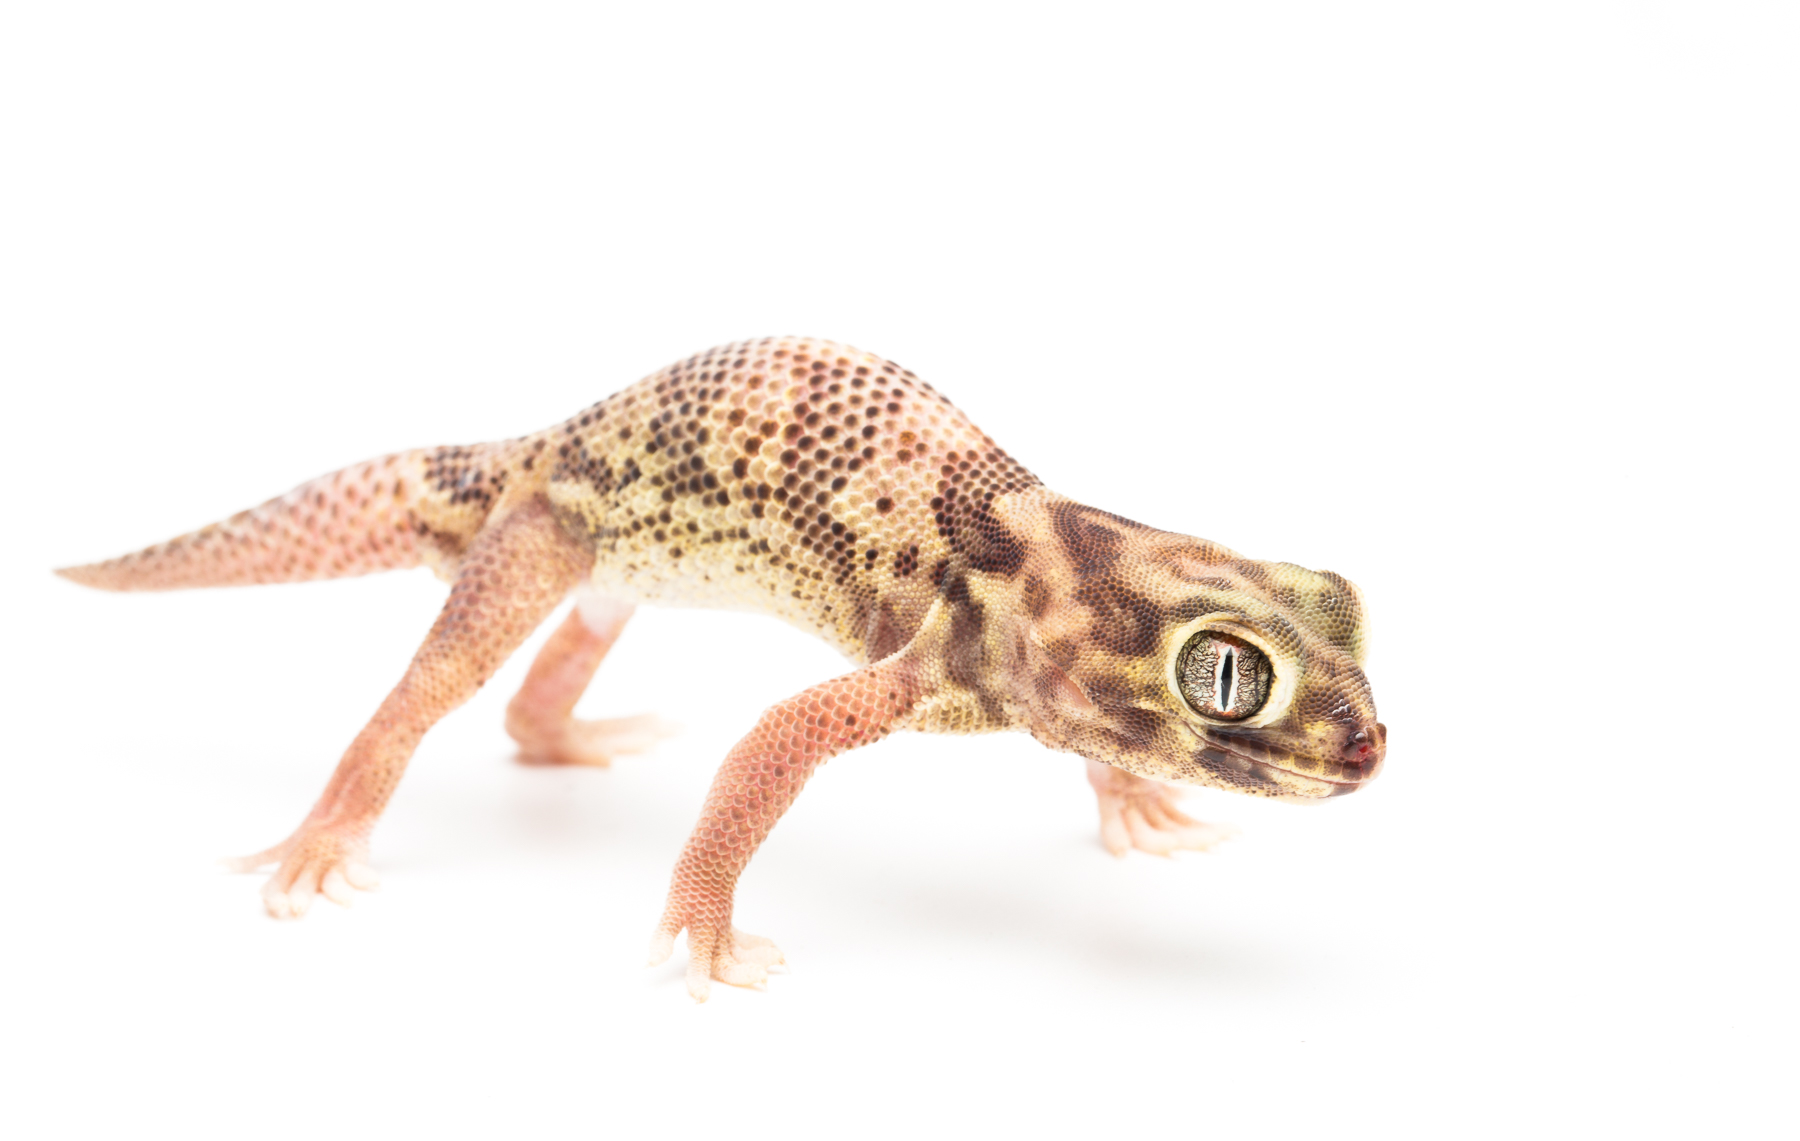 Adult male T. bedriagai in defensive posture